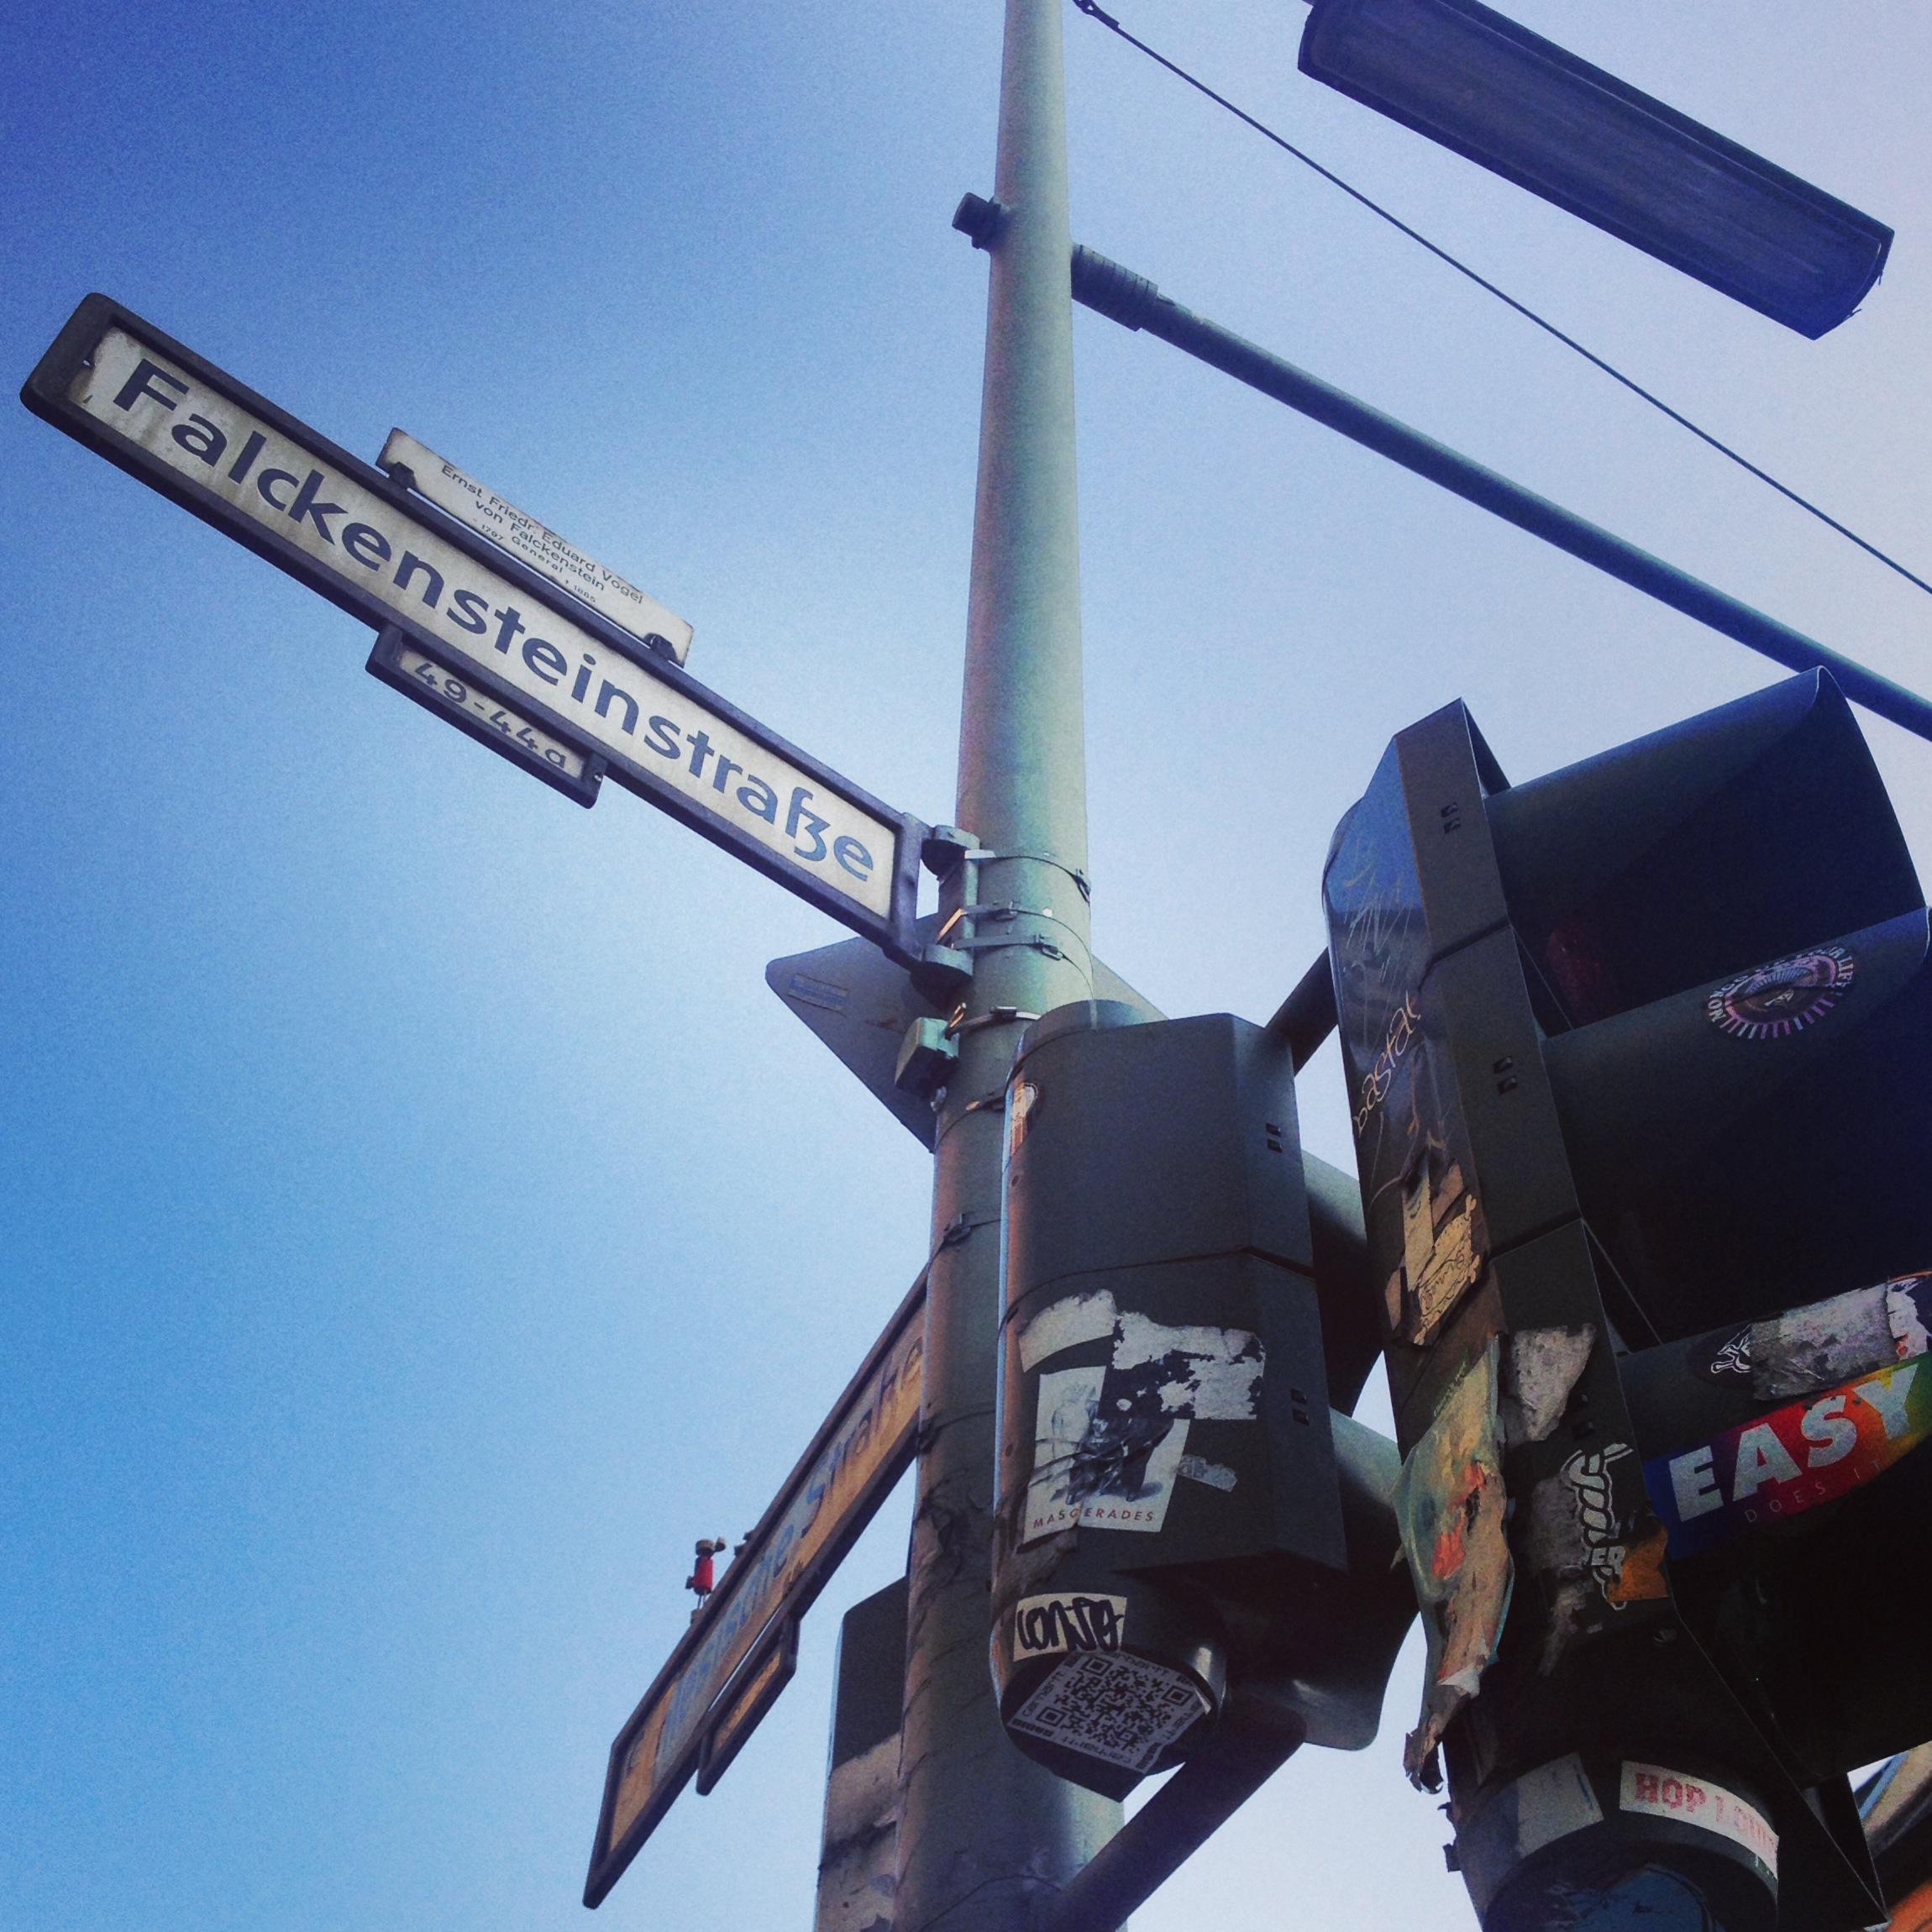 5-berlin-signpost.JPG